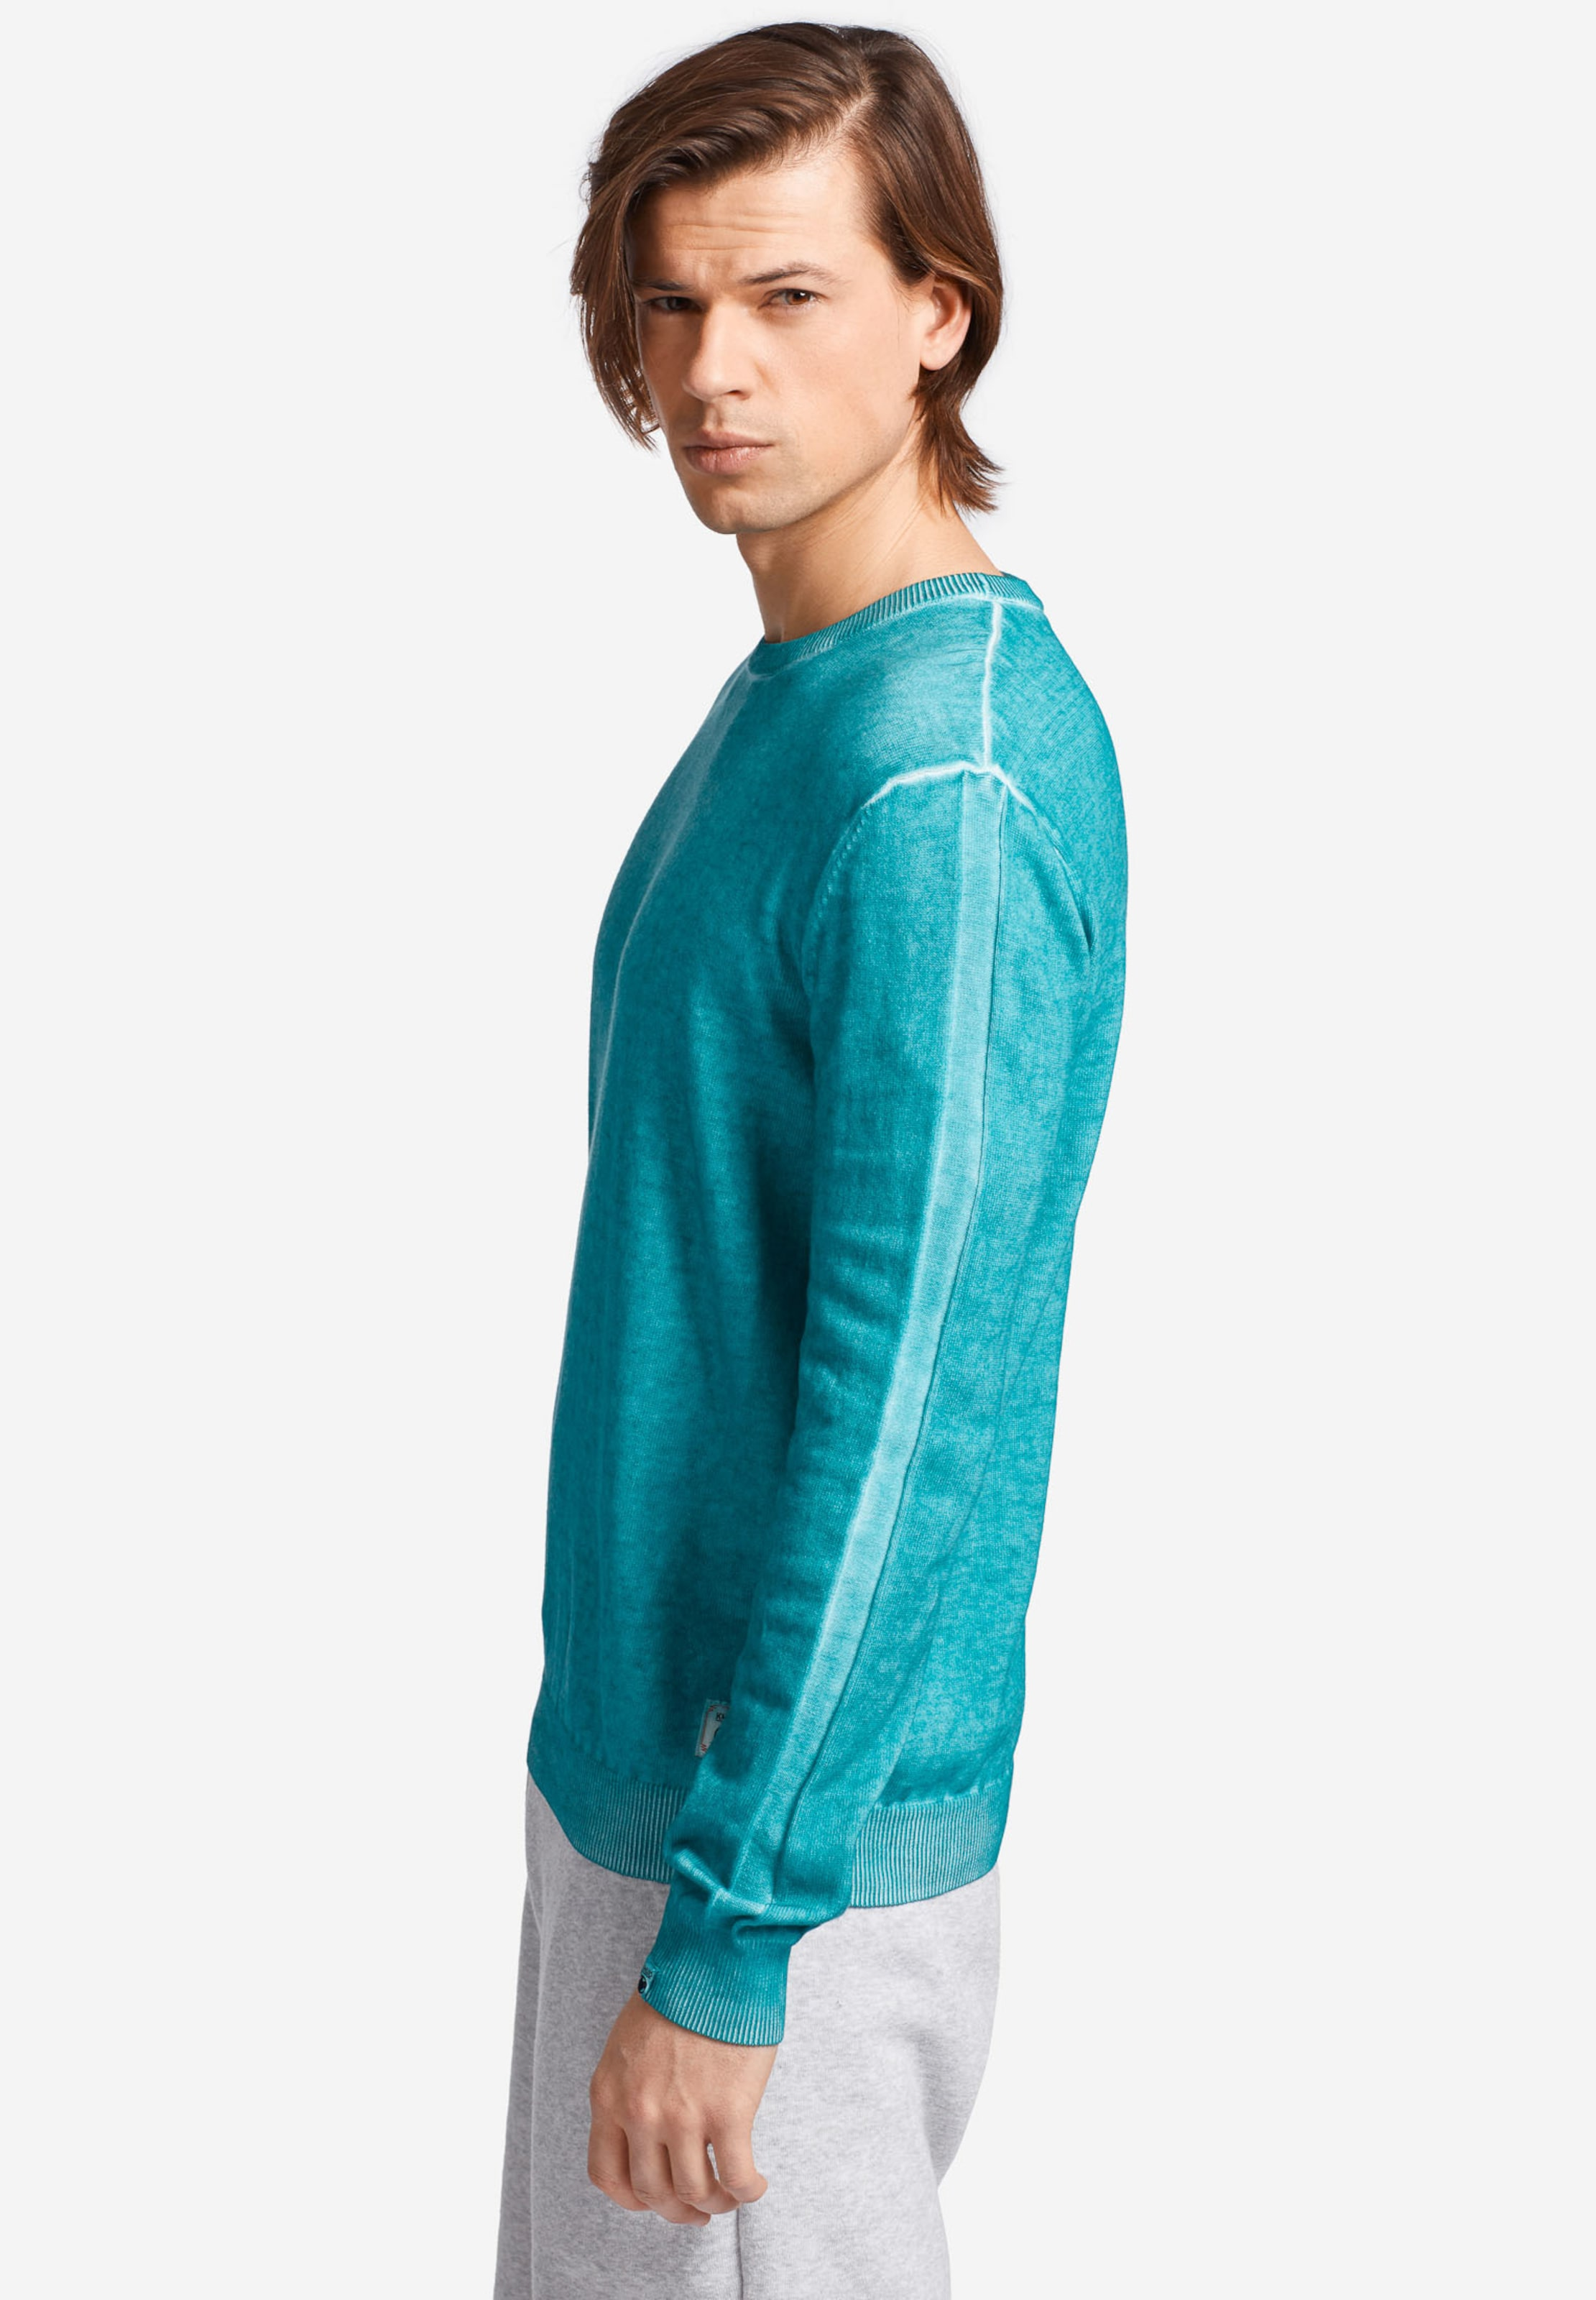 Khujo Pullover In Pullover In Pullover 'lysos' Jade 'lysos' In Khujo Khujo Jade 'lysos' RLqAj345